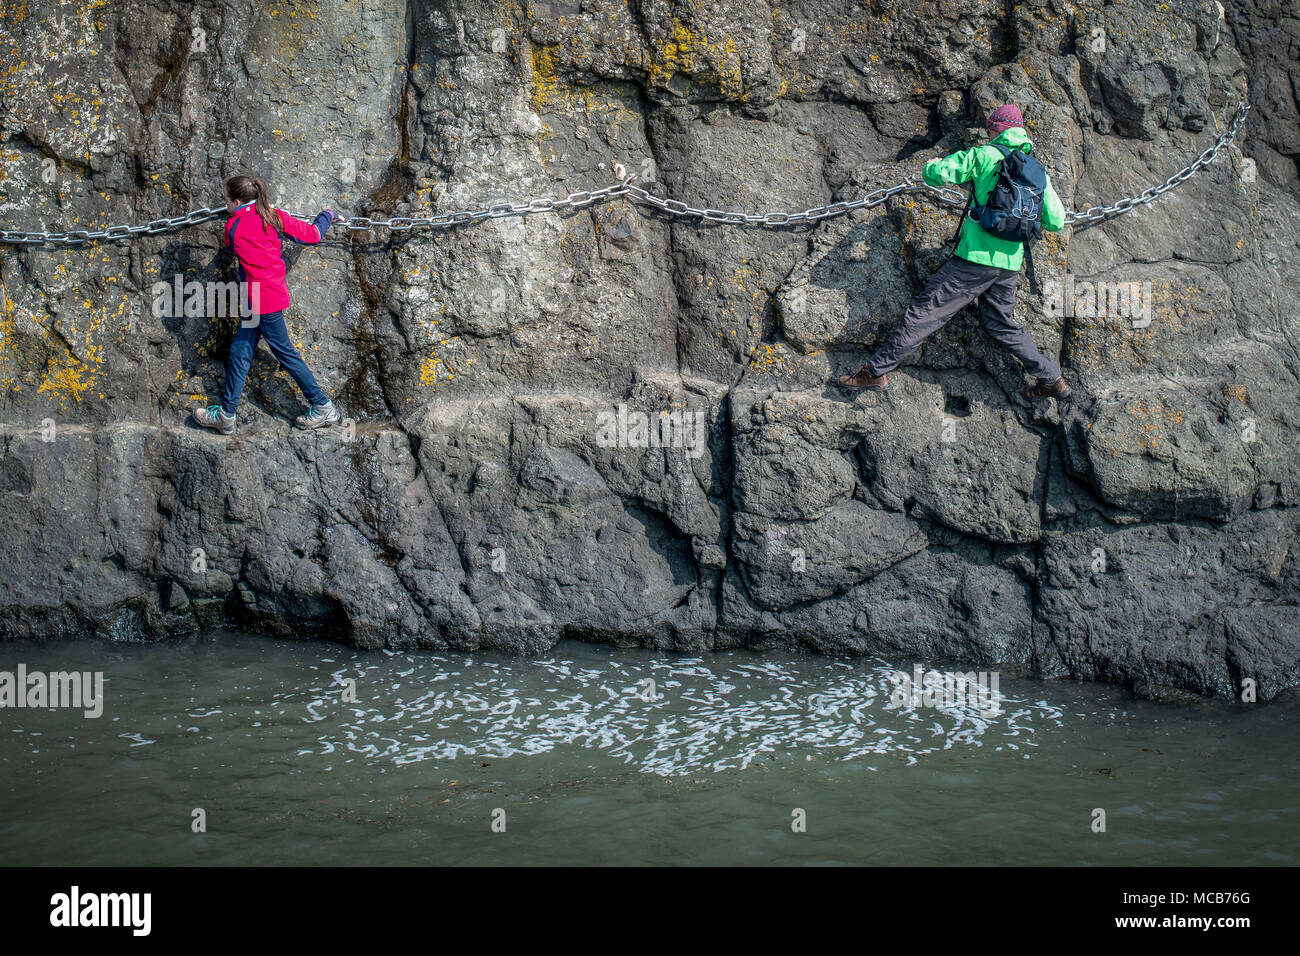 Elie UK Apr 15 2018; Elie Chain Walk in Fife is one of the most unique coastal walks in Scotland. credit steven scott taylor / alamy live news - Stock Image